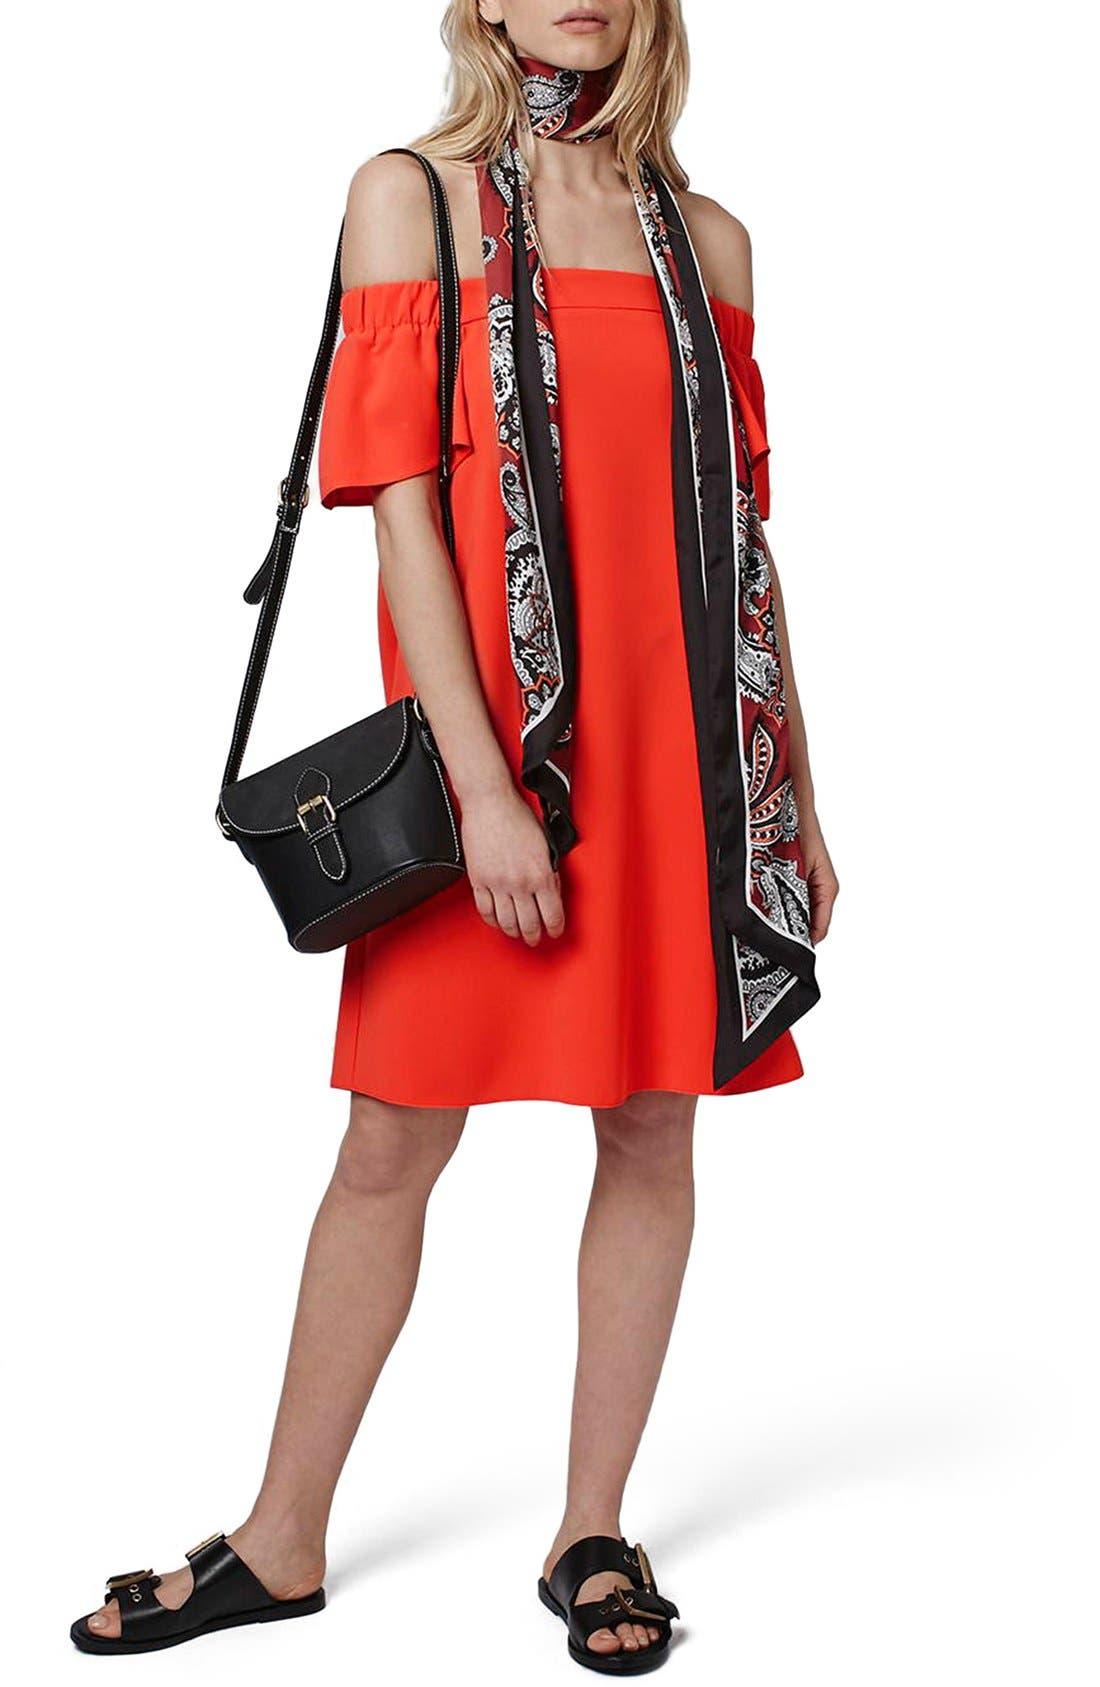 Alternate Image 1 Selected - Topshop Off the Shoulder Trapeze Dress (Regular & Petite)